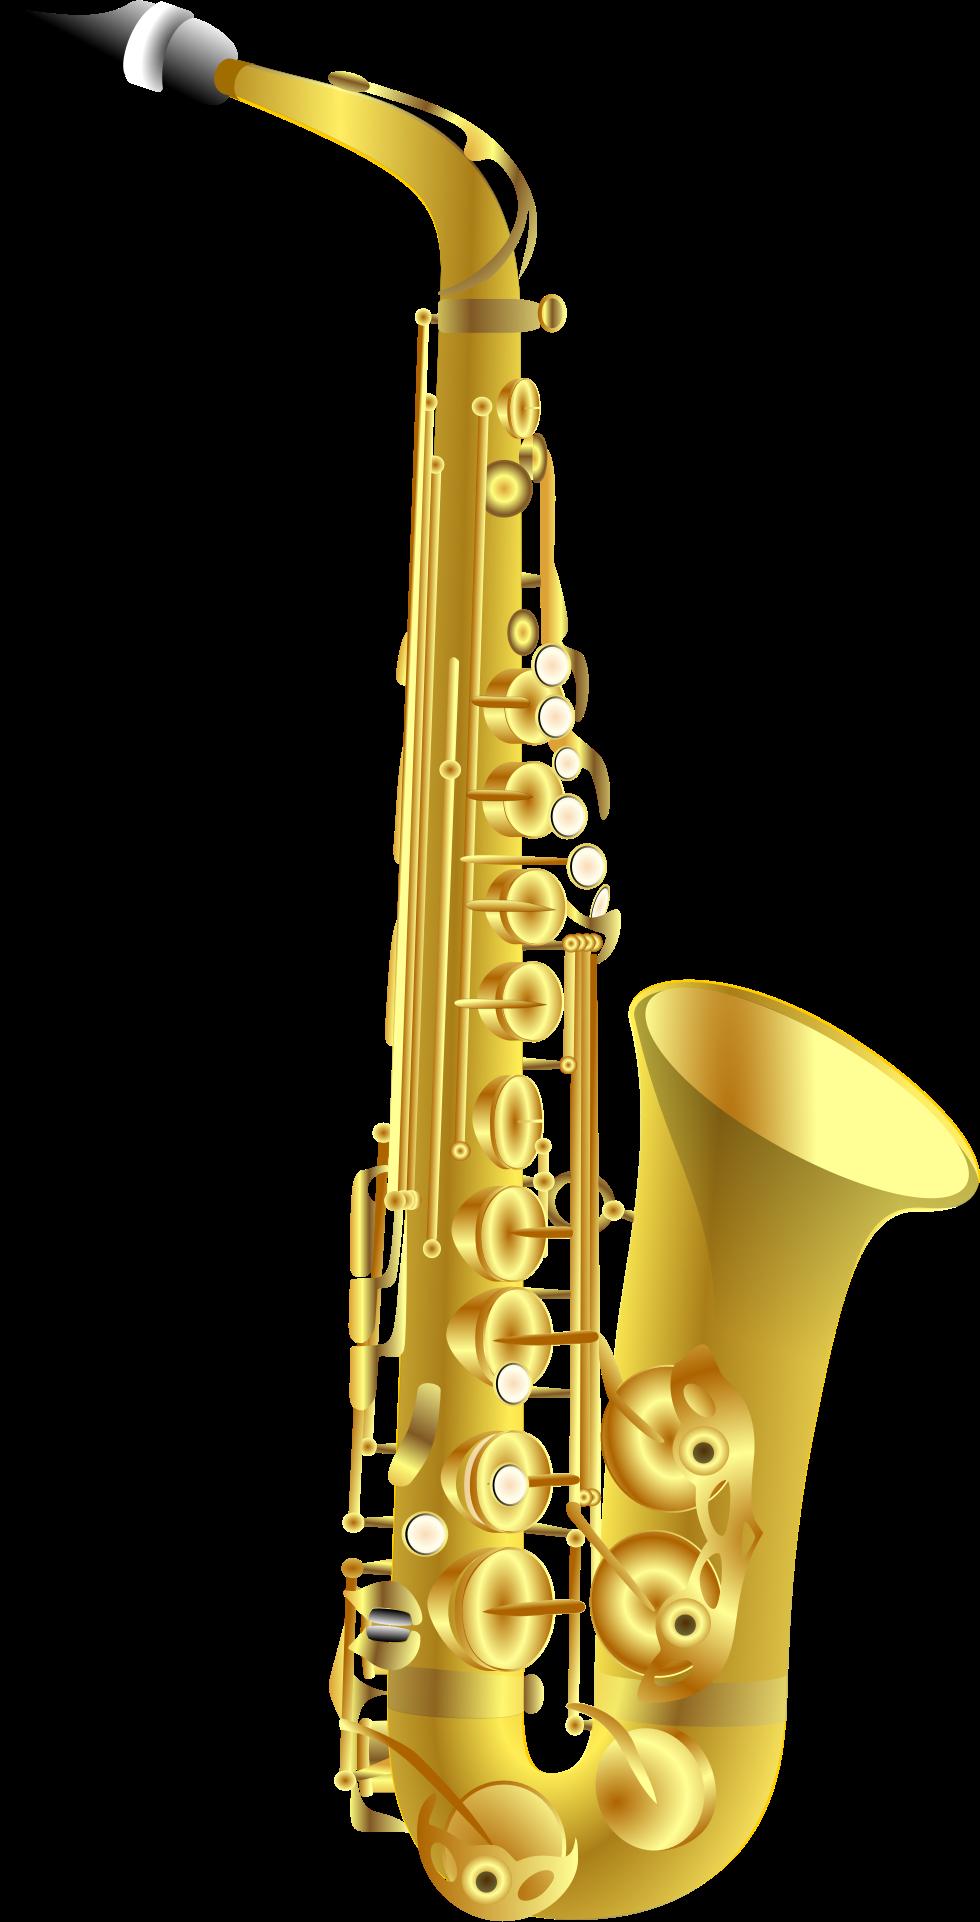 Clarinet clipart saxophone.